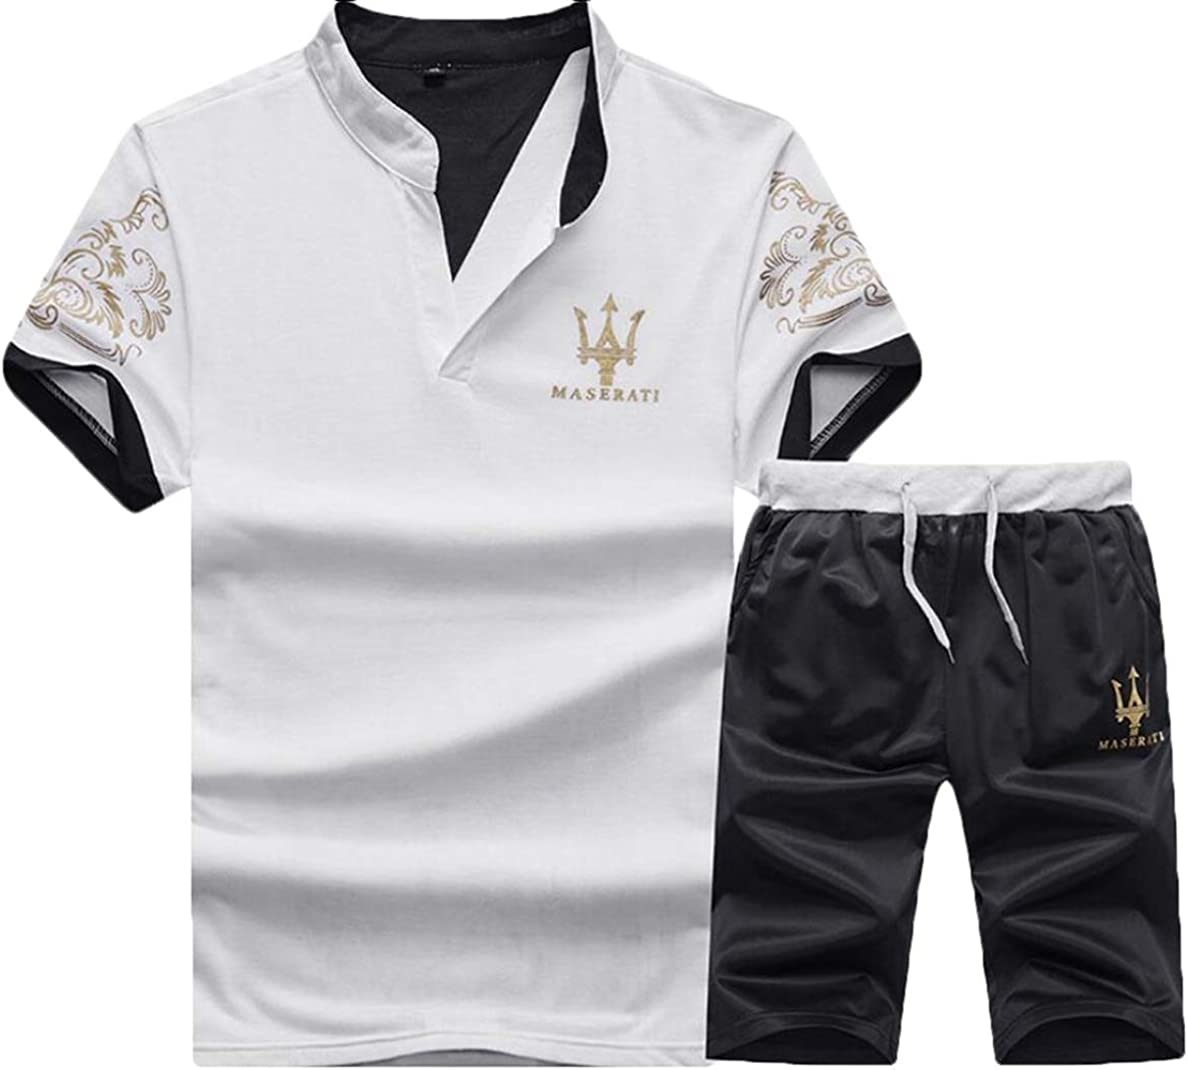 Men 2 Piece Outfits Sets Casual Active Summer Shirt Shorts Tracksuits